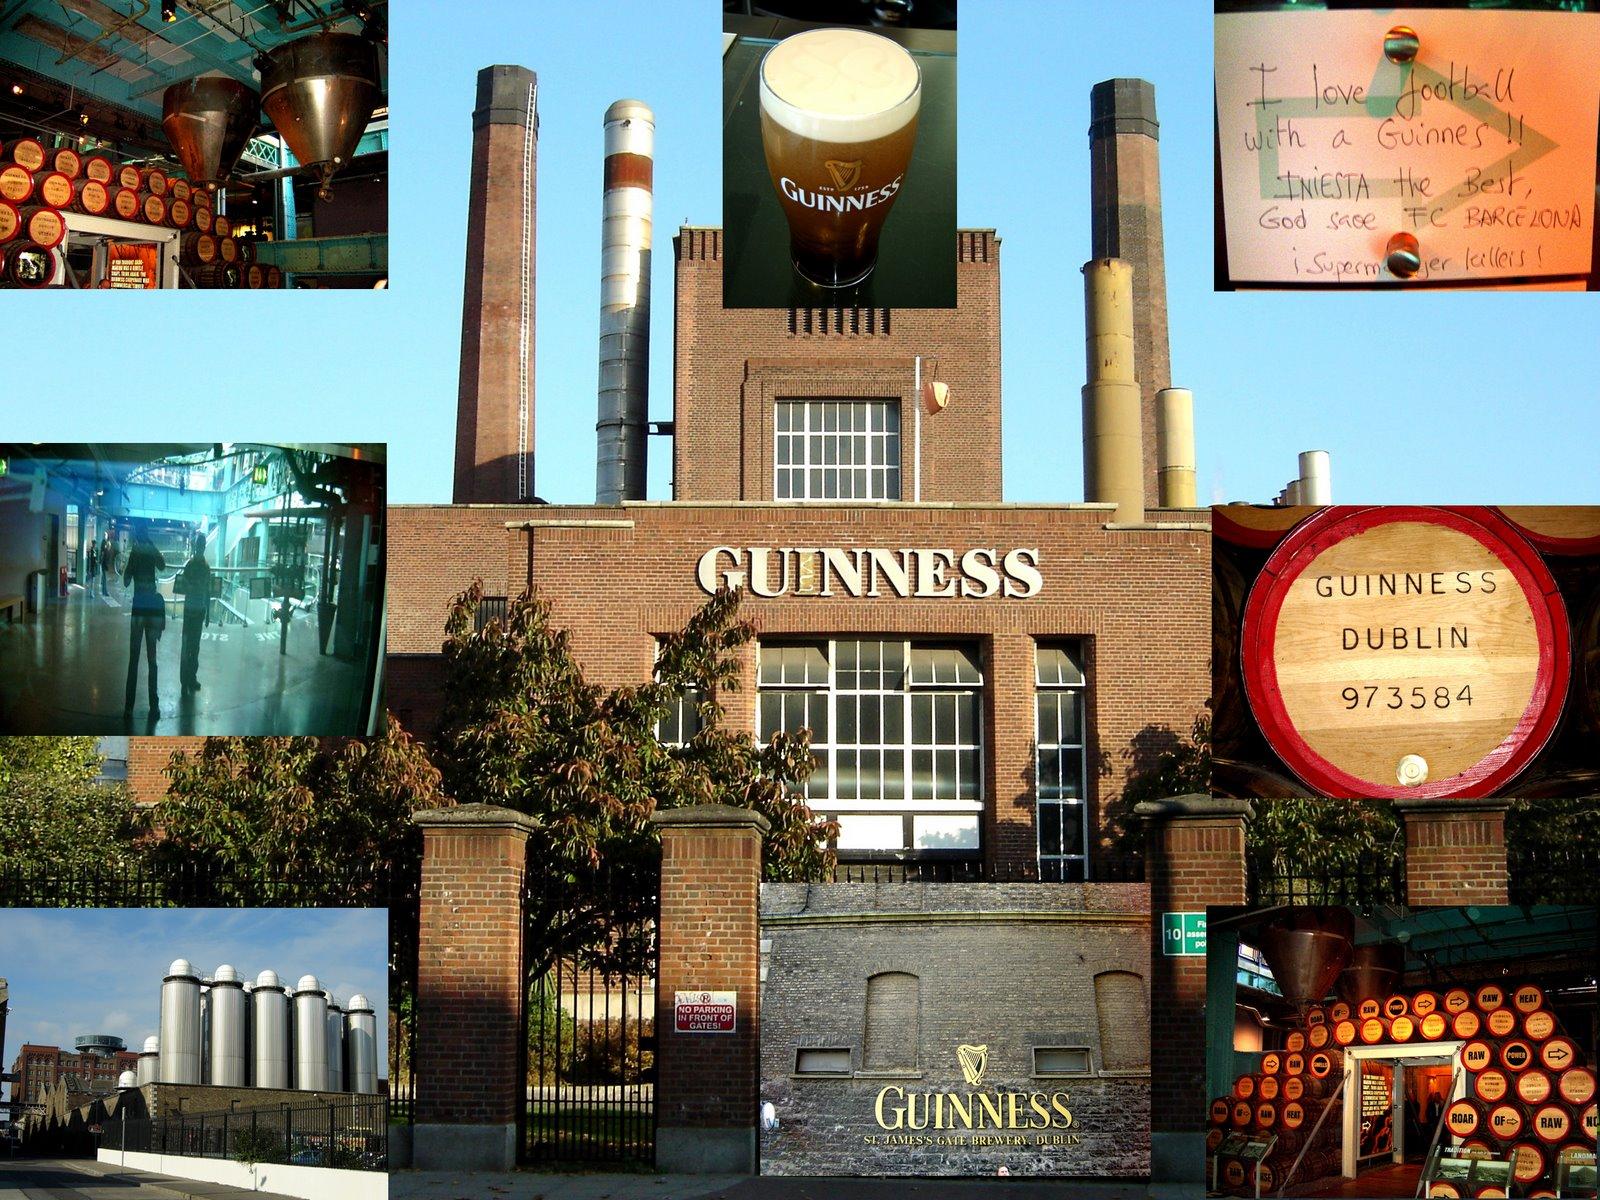 GUINNESS, UN BON MOTIU PER VISITAR DUBLIN